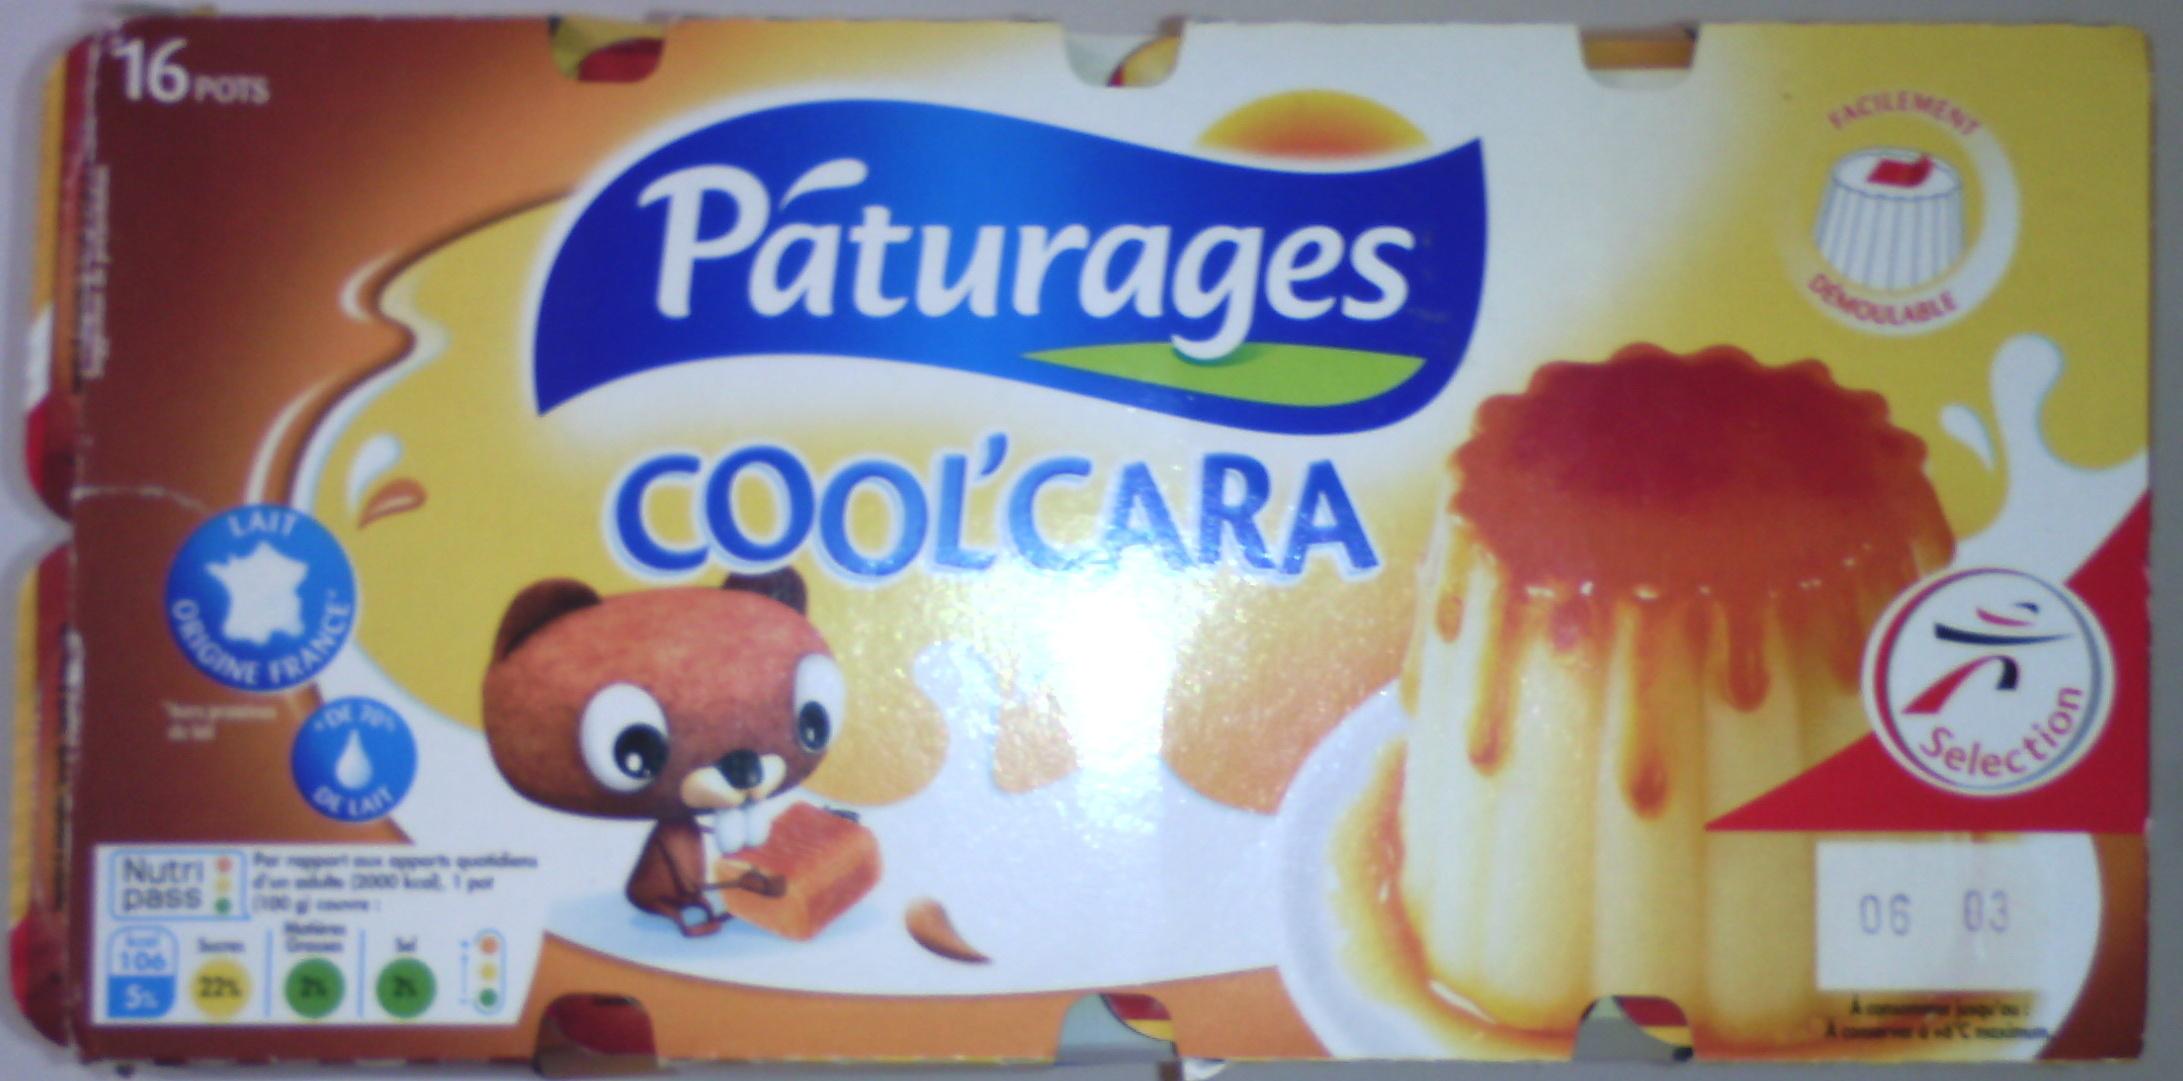 Cool'cara - Product